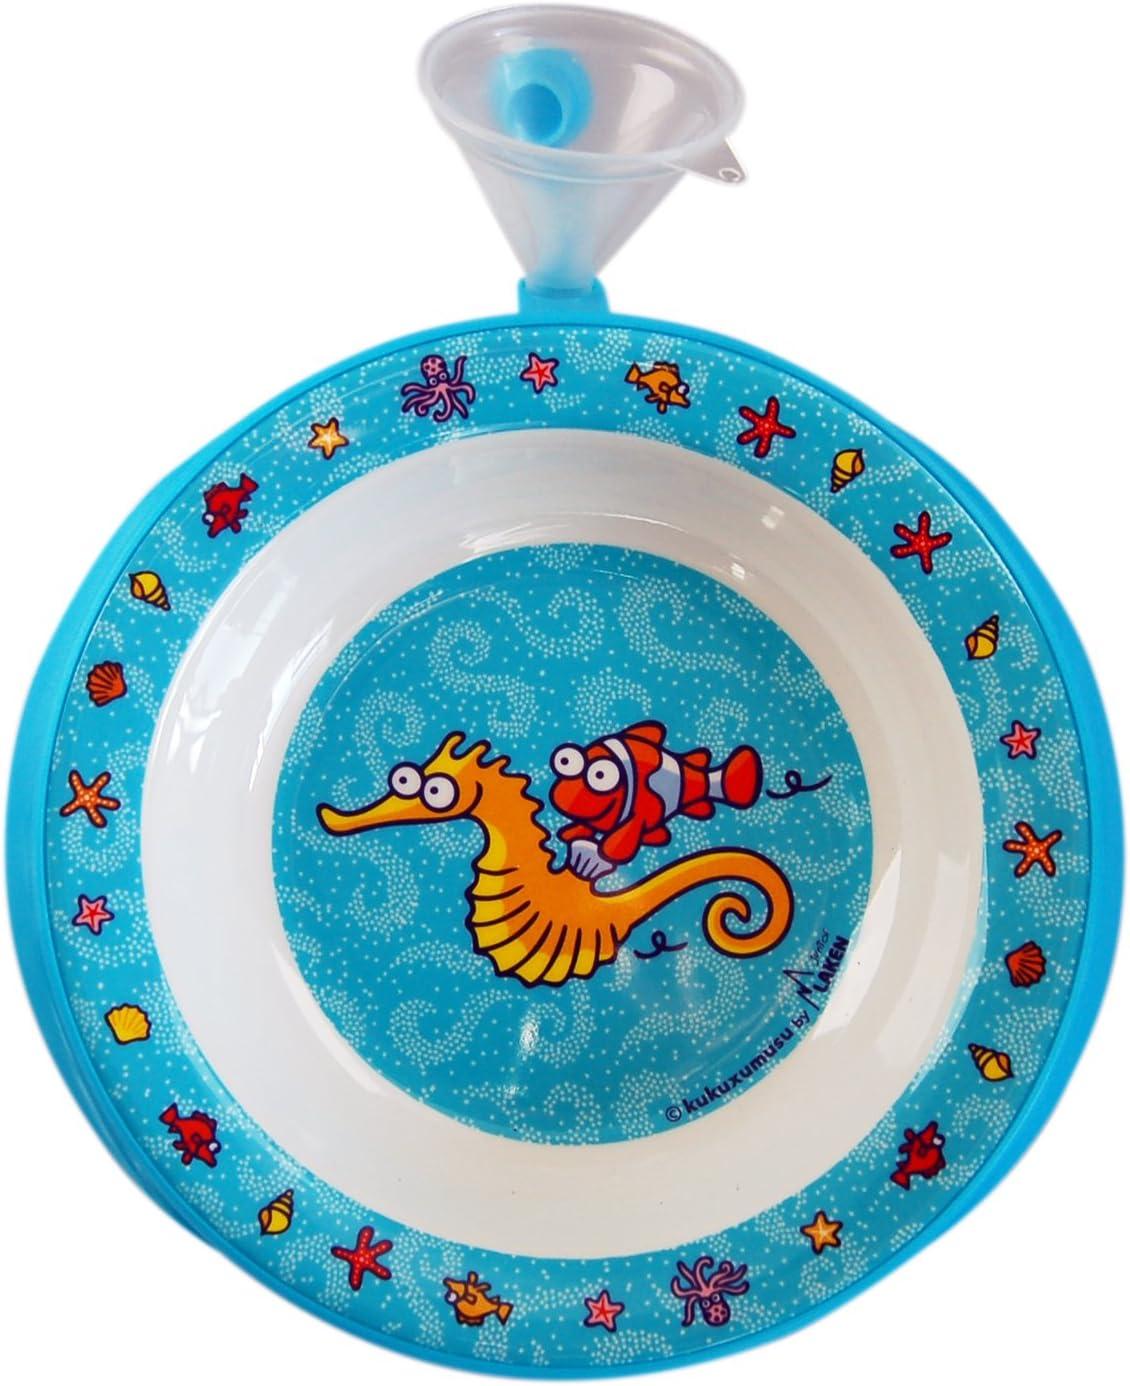 Kukuxumusu Plato-Termo Infantil Azul con Embudo